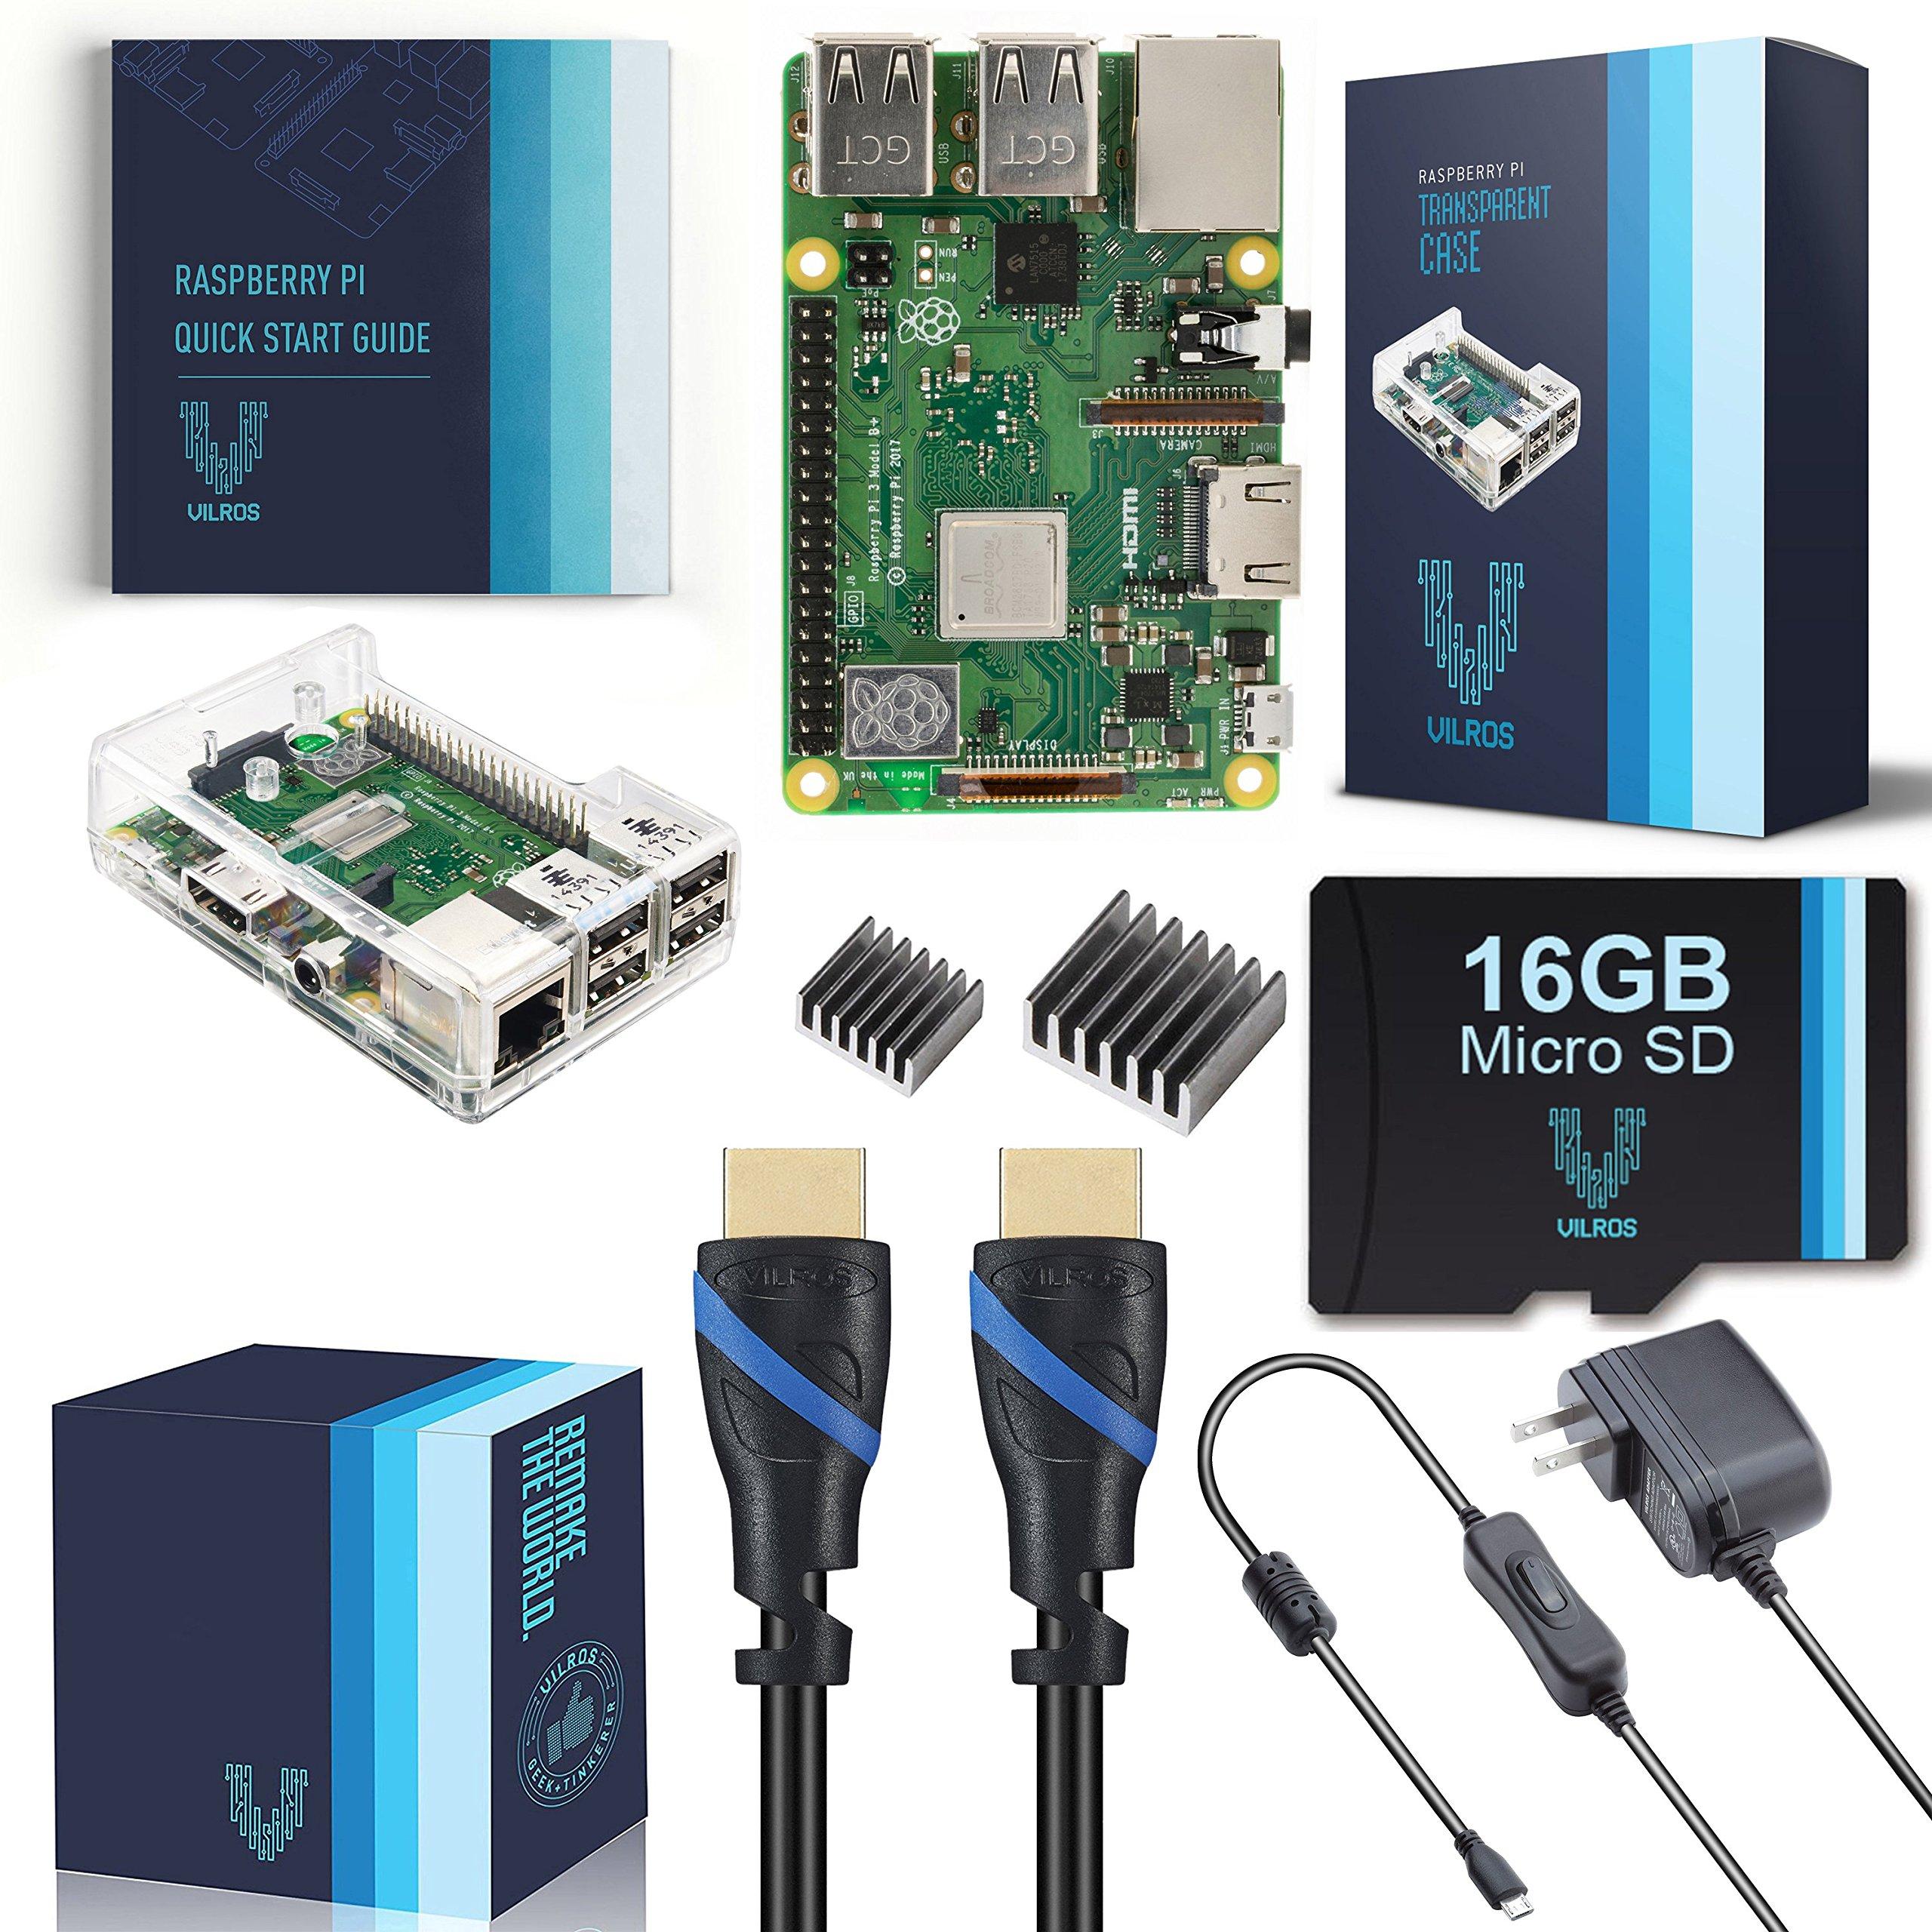 V-Kits Raspberry Pi 3 B+ (B Plus) Complete Starter Kit (16GB & Clear Case Edition) [LATEST MODEL 2018]